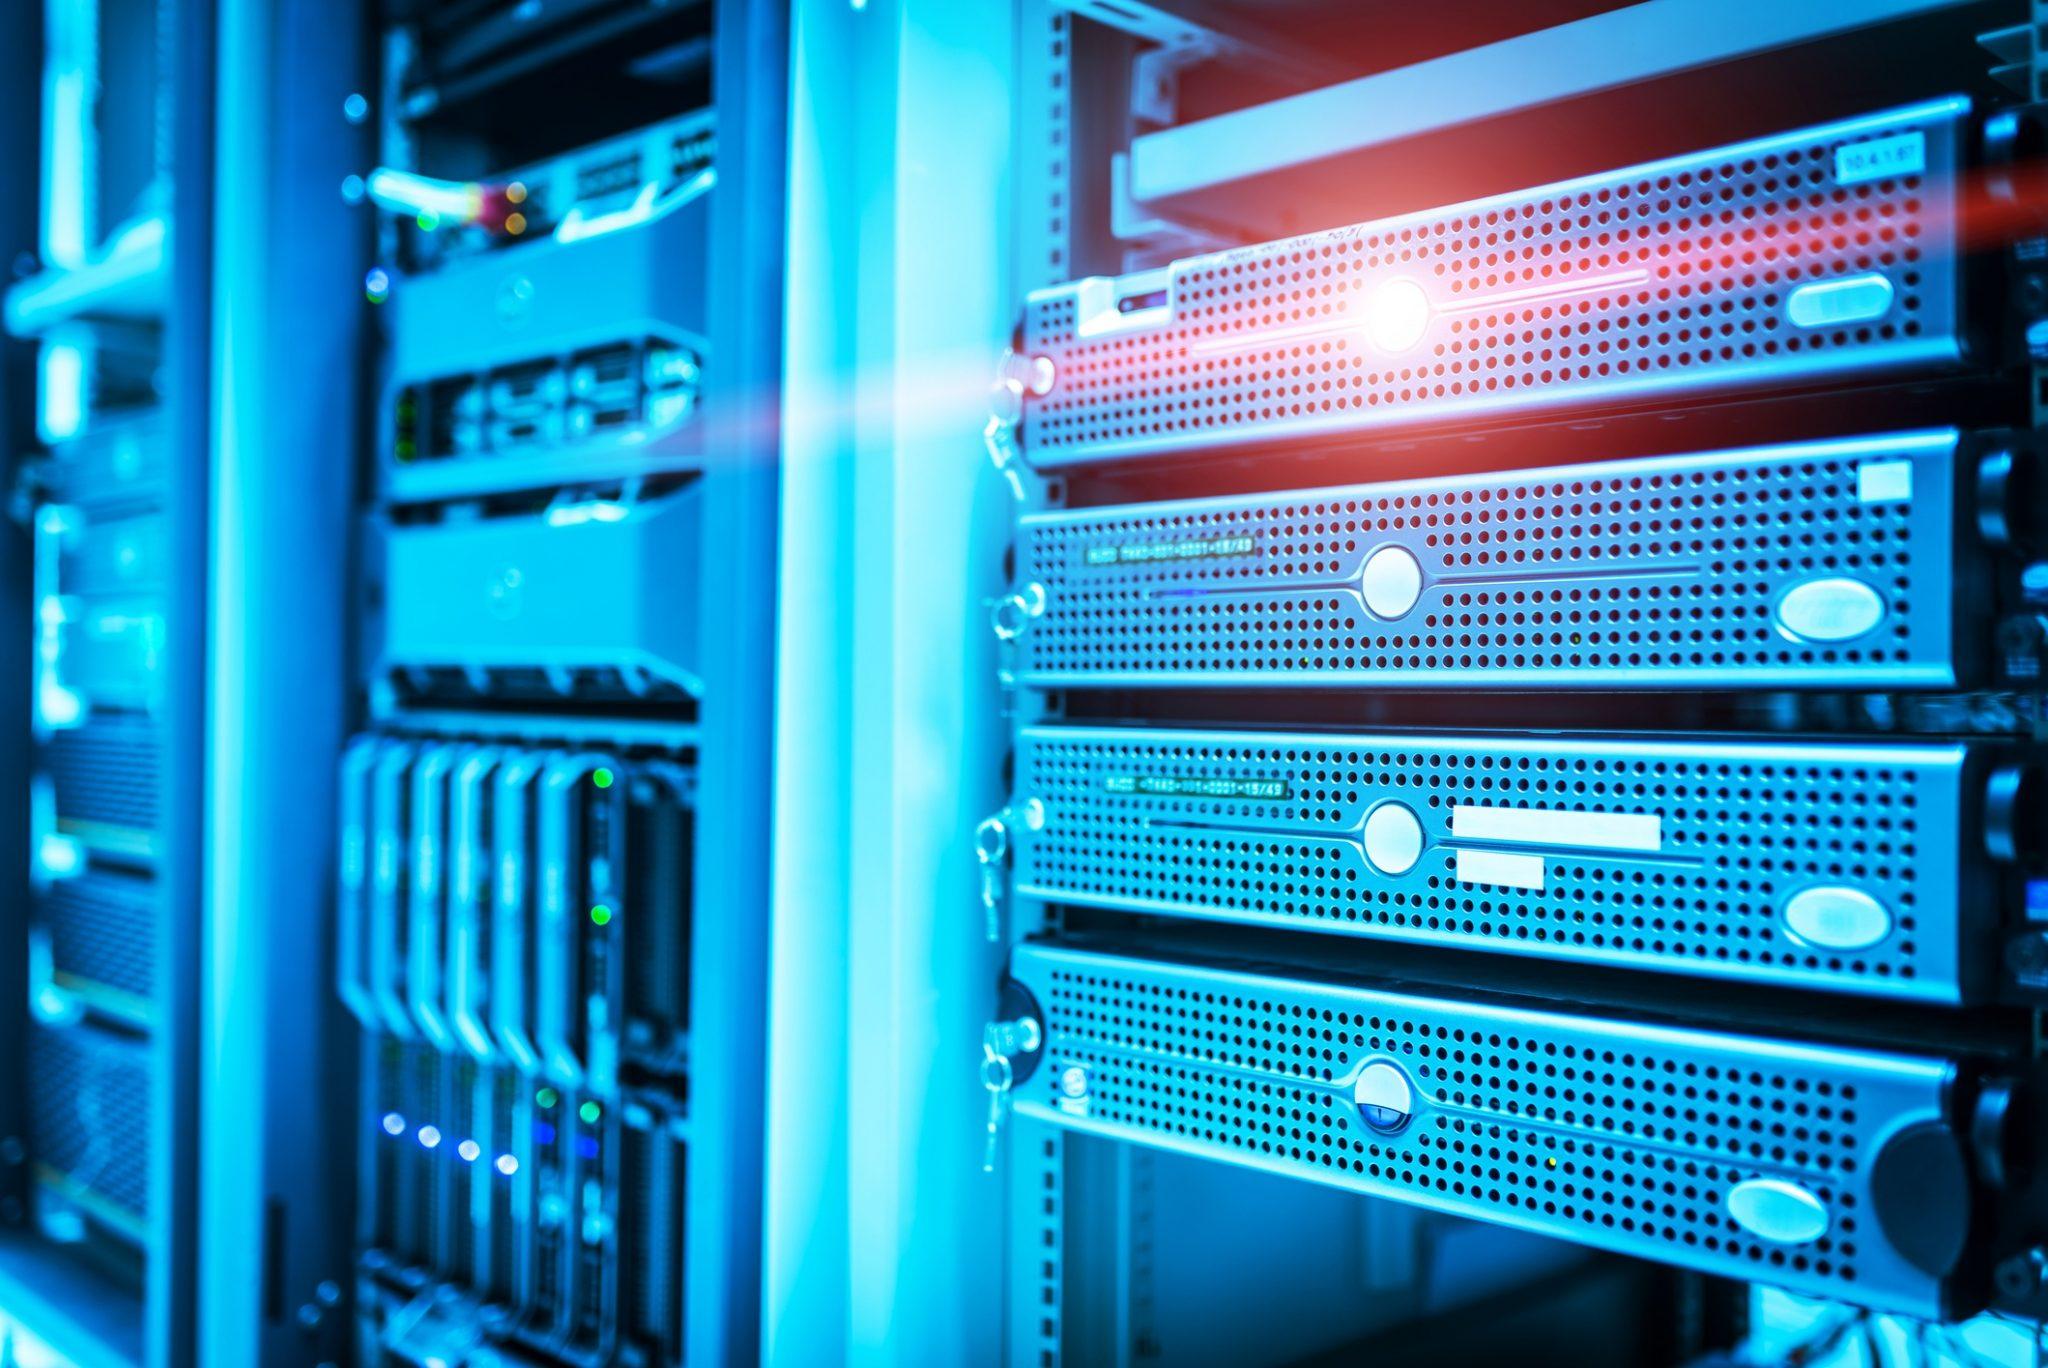 E se cair a energia? O Datacenter continua funcionando?